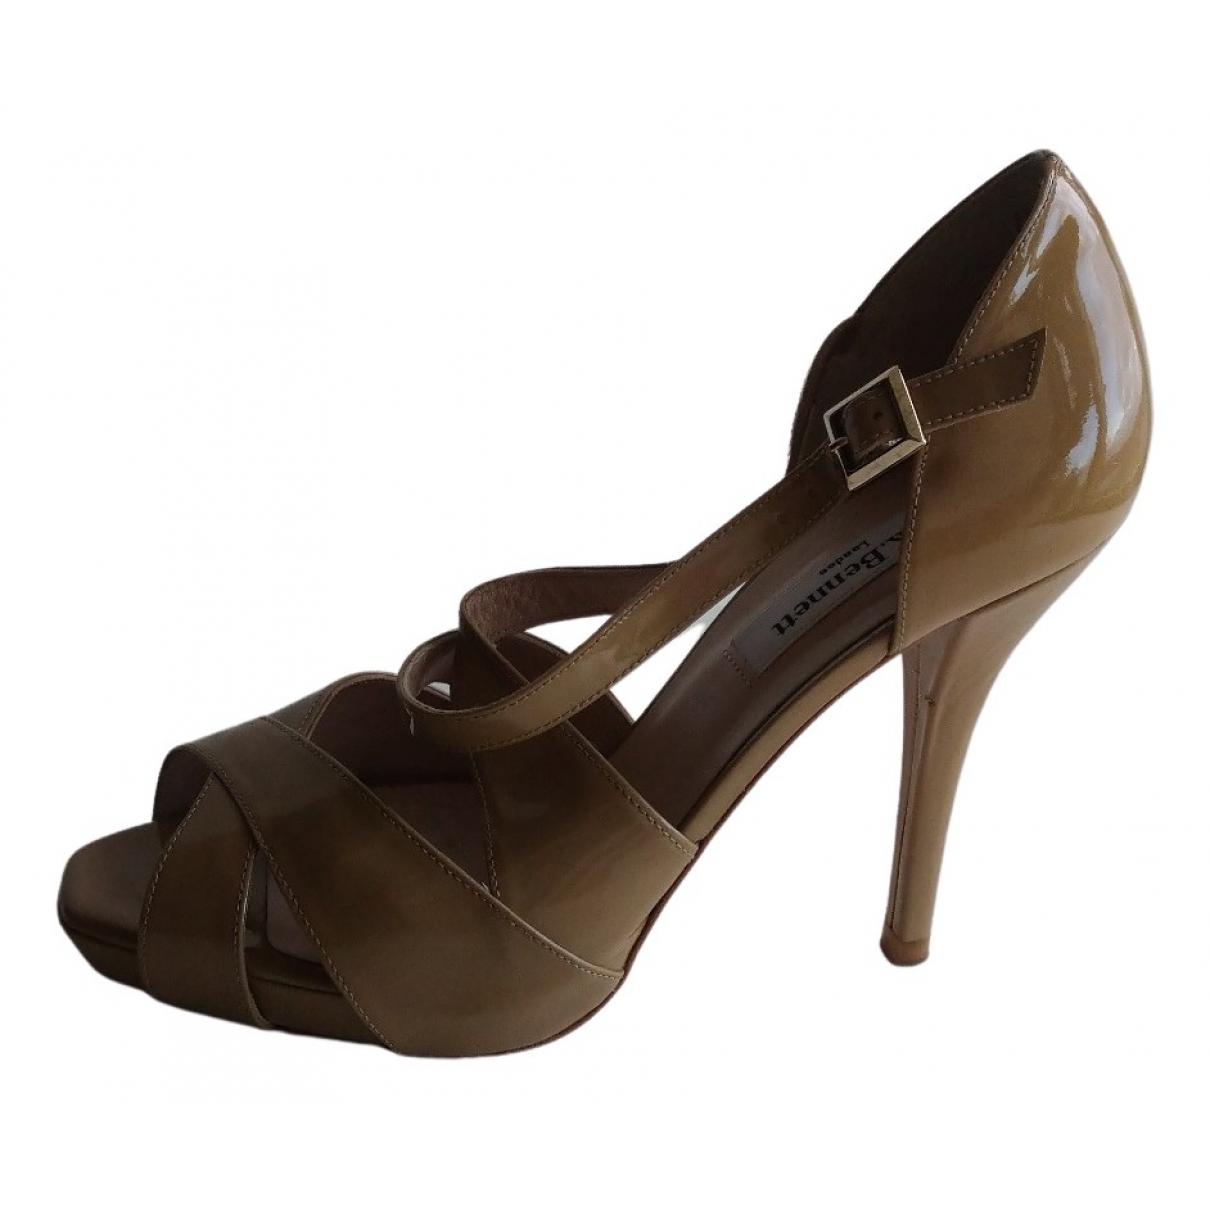 Lk Bennett N Beige Patent leather Sandals for Women 37.5 EU